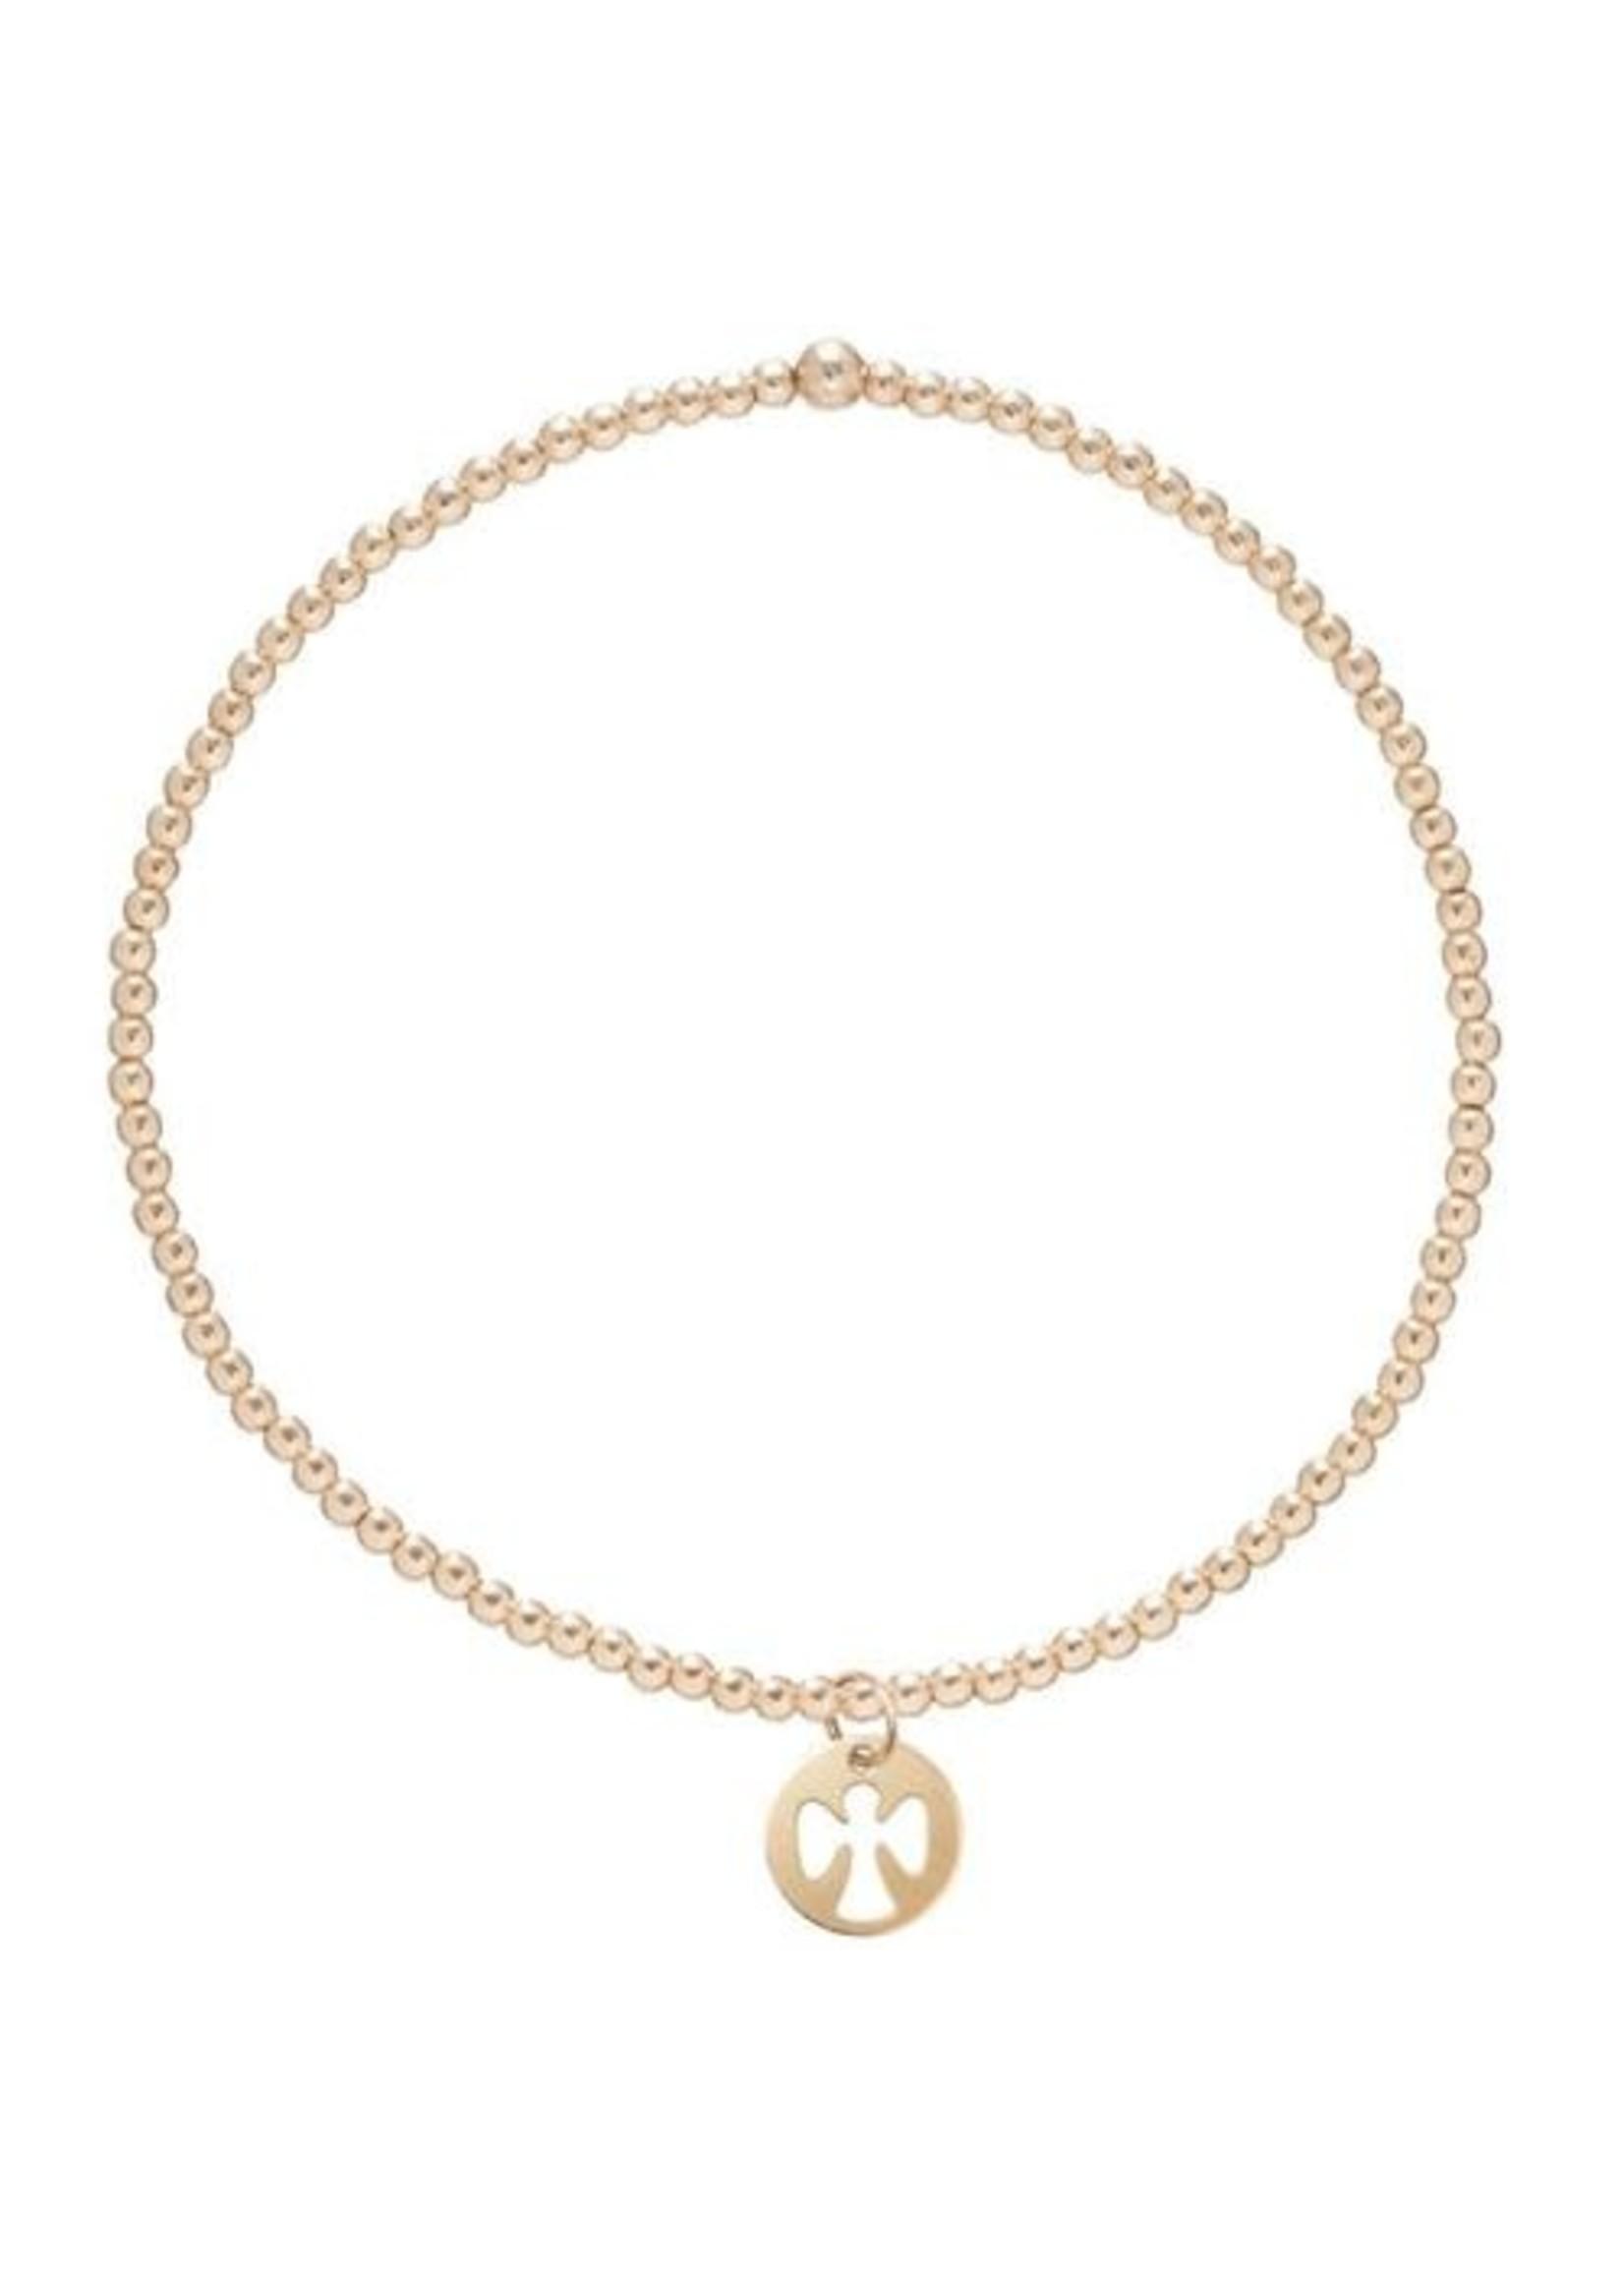 enewton Classic Gold 2mm Bead Bracelet- Guardian Angel Small Gold Charm